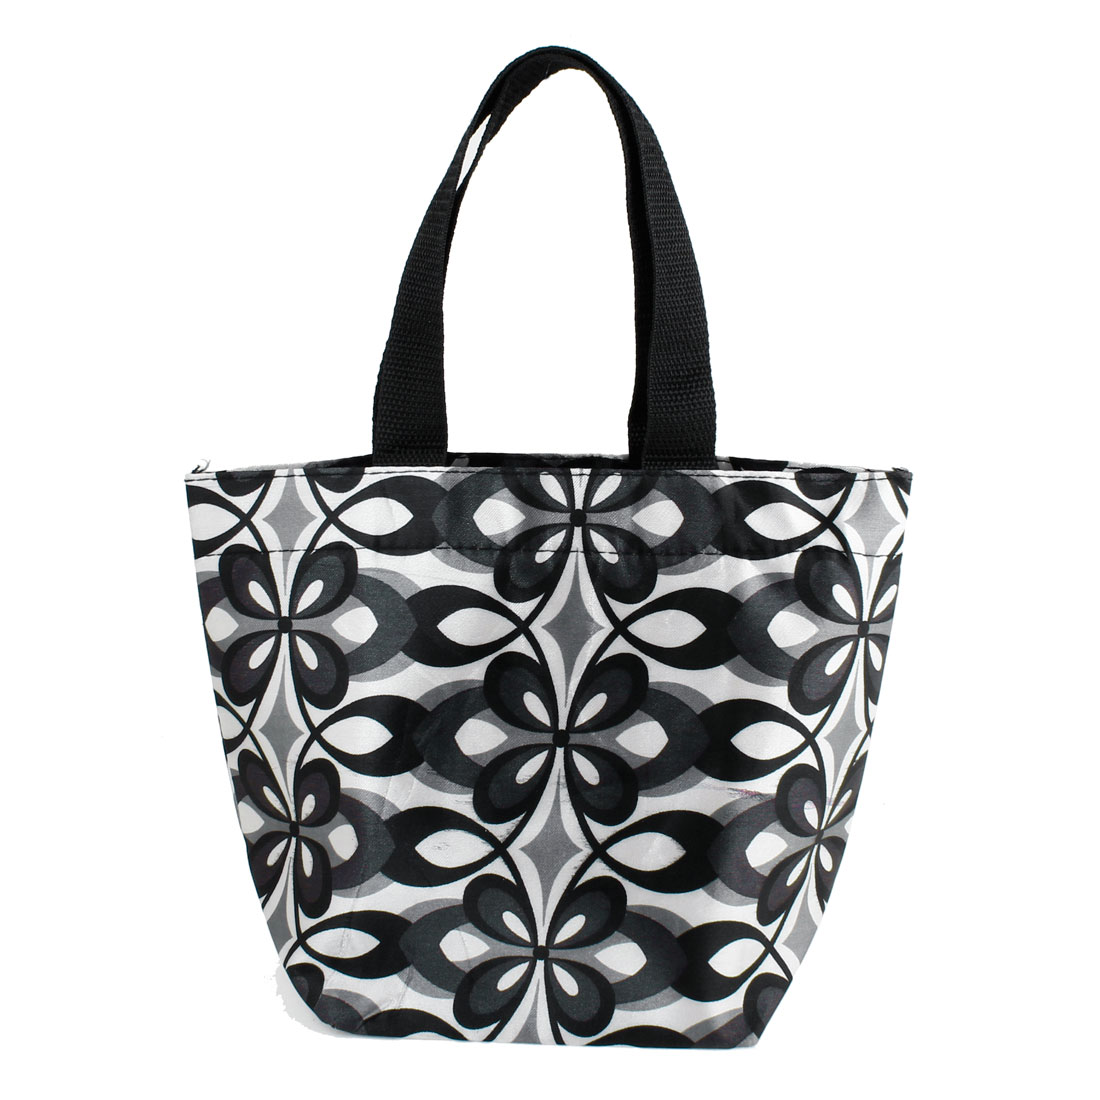 Flower Pattern Recycle Shopping Handbag Totes White Black